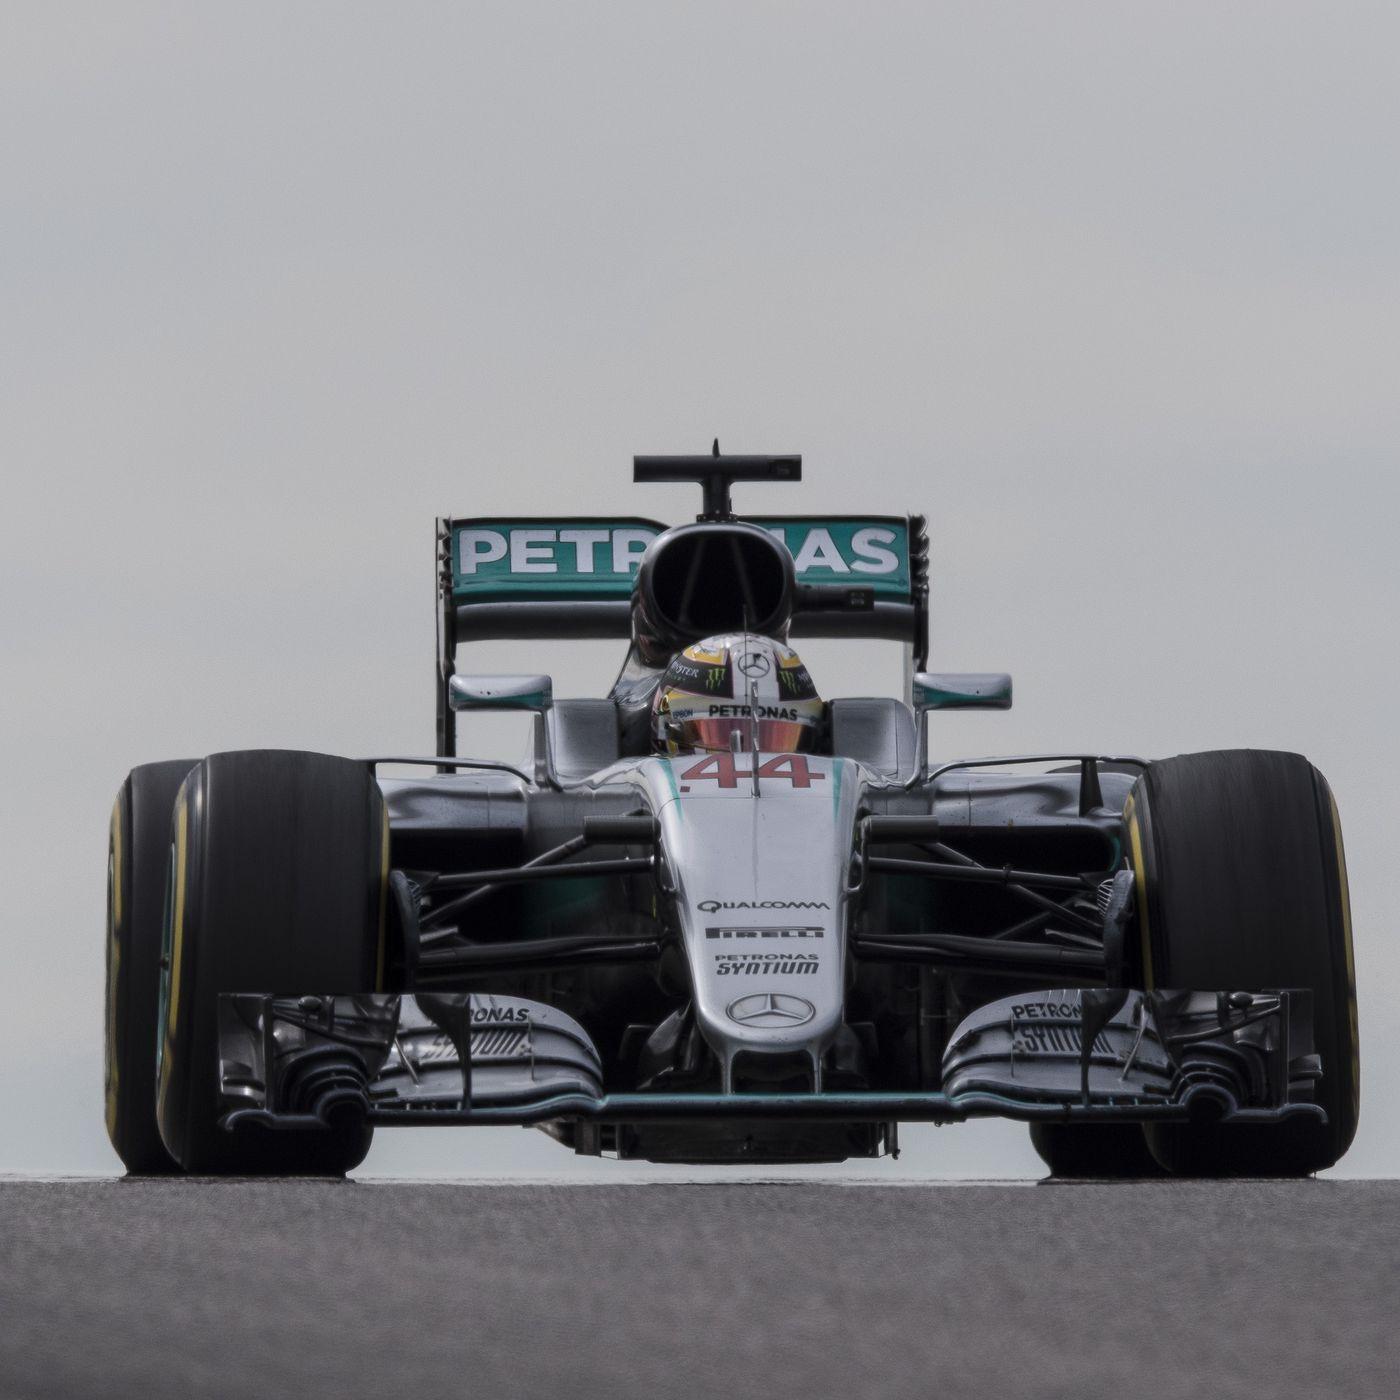 Formula 1 2016 Qualifying Results For Brazilian Grand Prix Sbnation Com